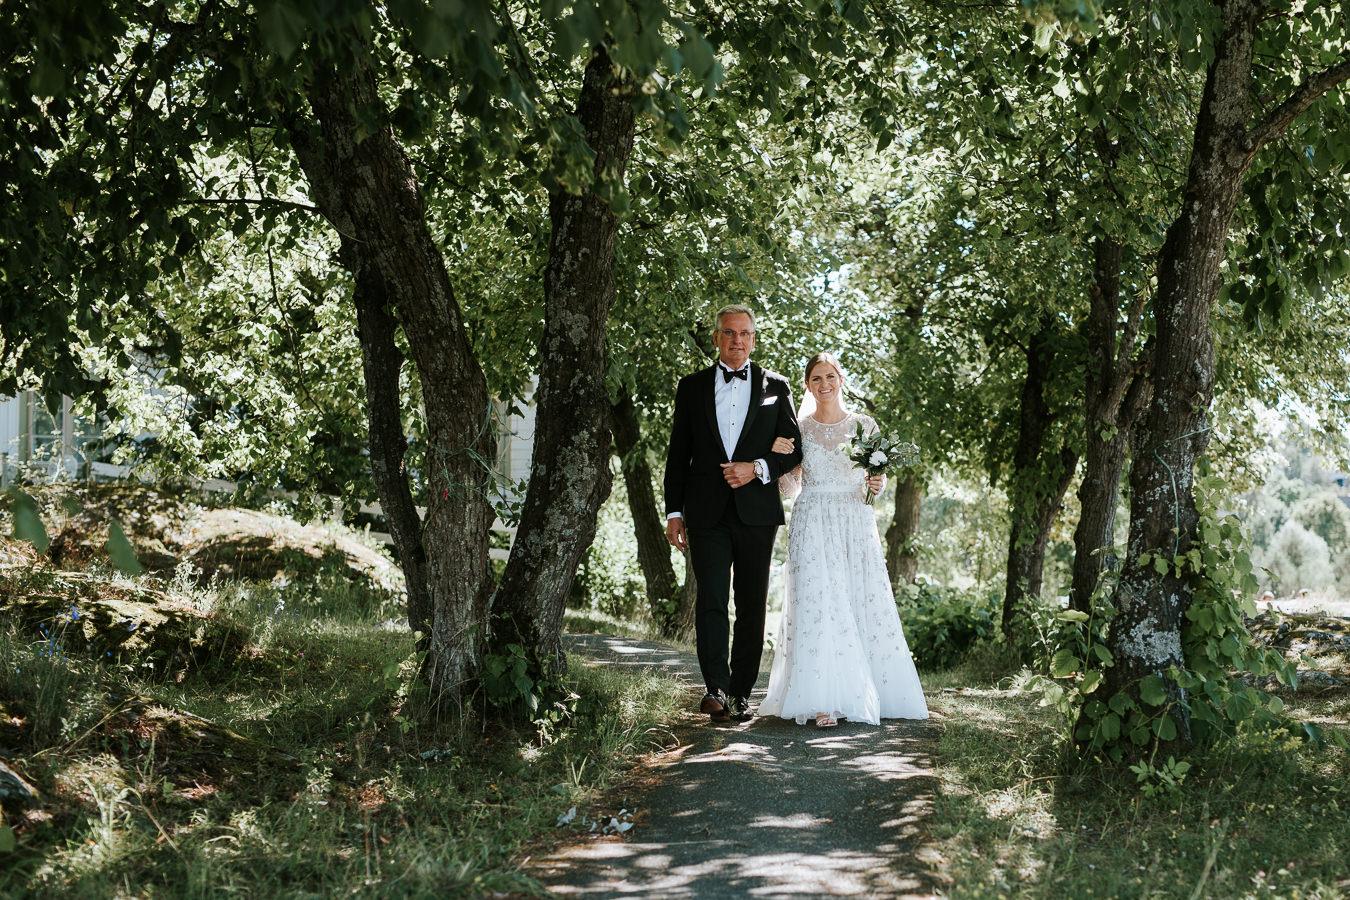 Bryllup-Hellviktangen-fotograf-tvedt-117.jpg